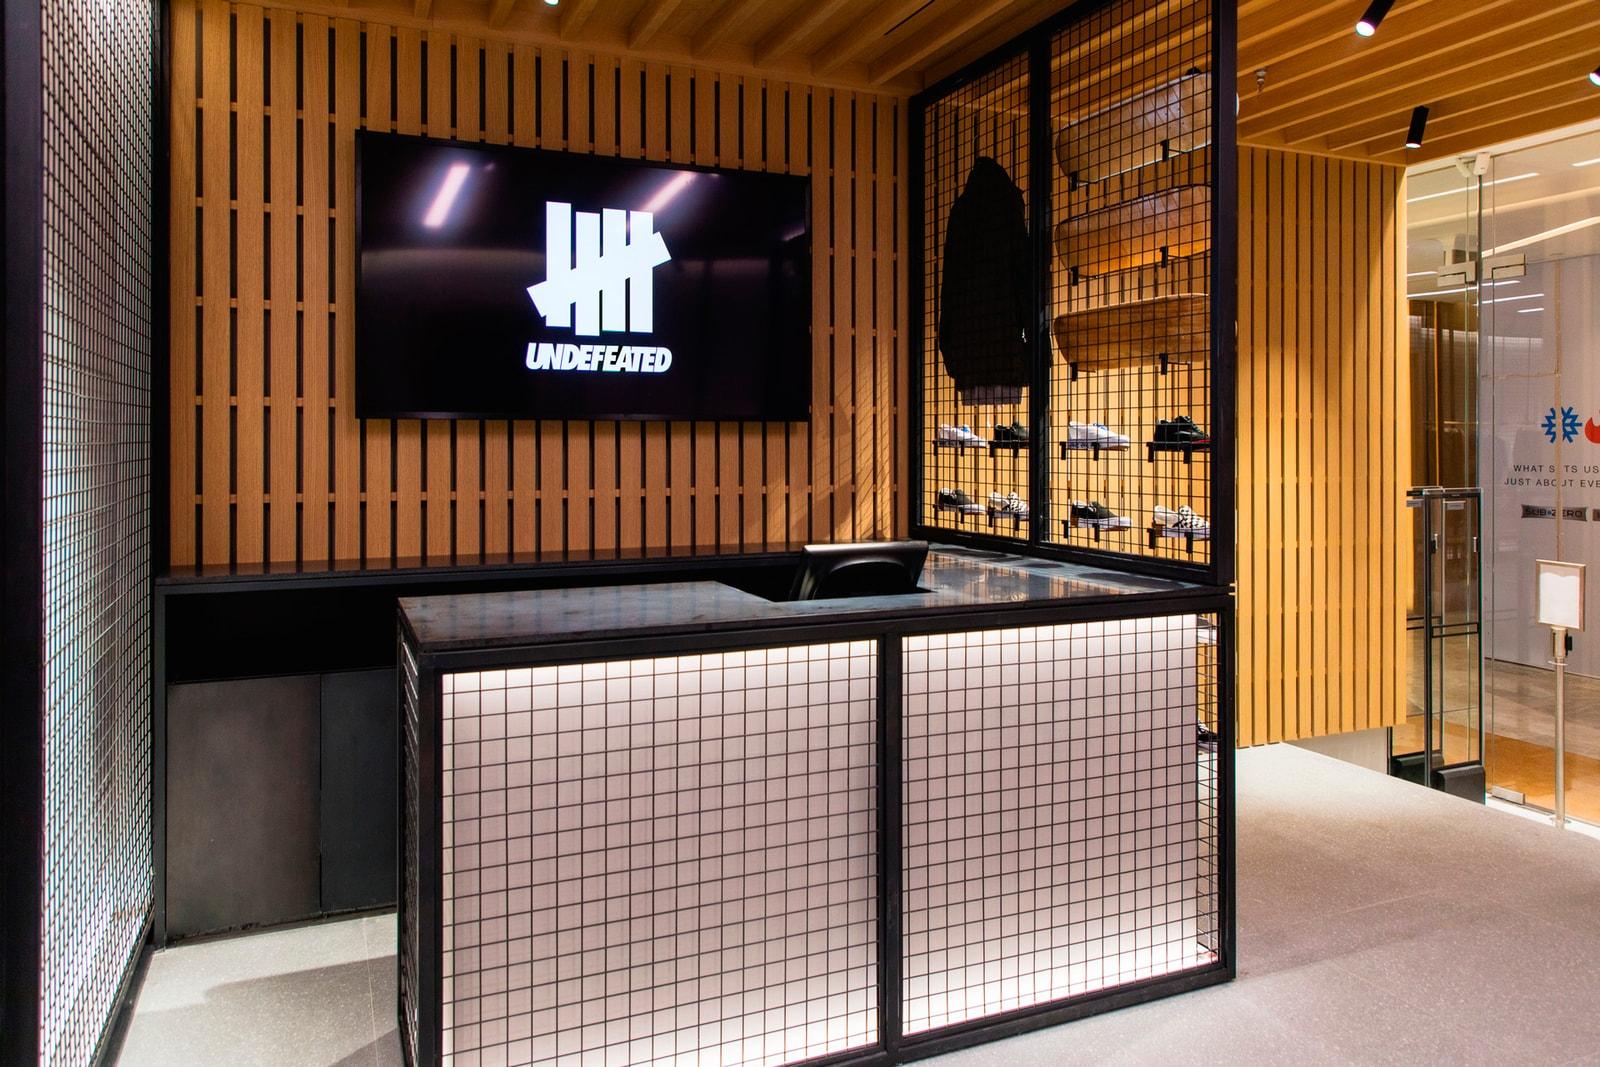 James Bond UNDEFEATED Hong Kong Store Interview bape a bathing ape Purple Nike Zoom Kobe 1 Protro Friends & Family